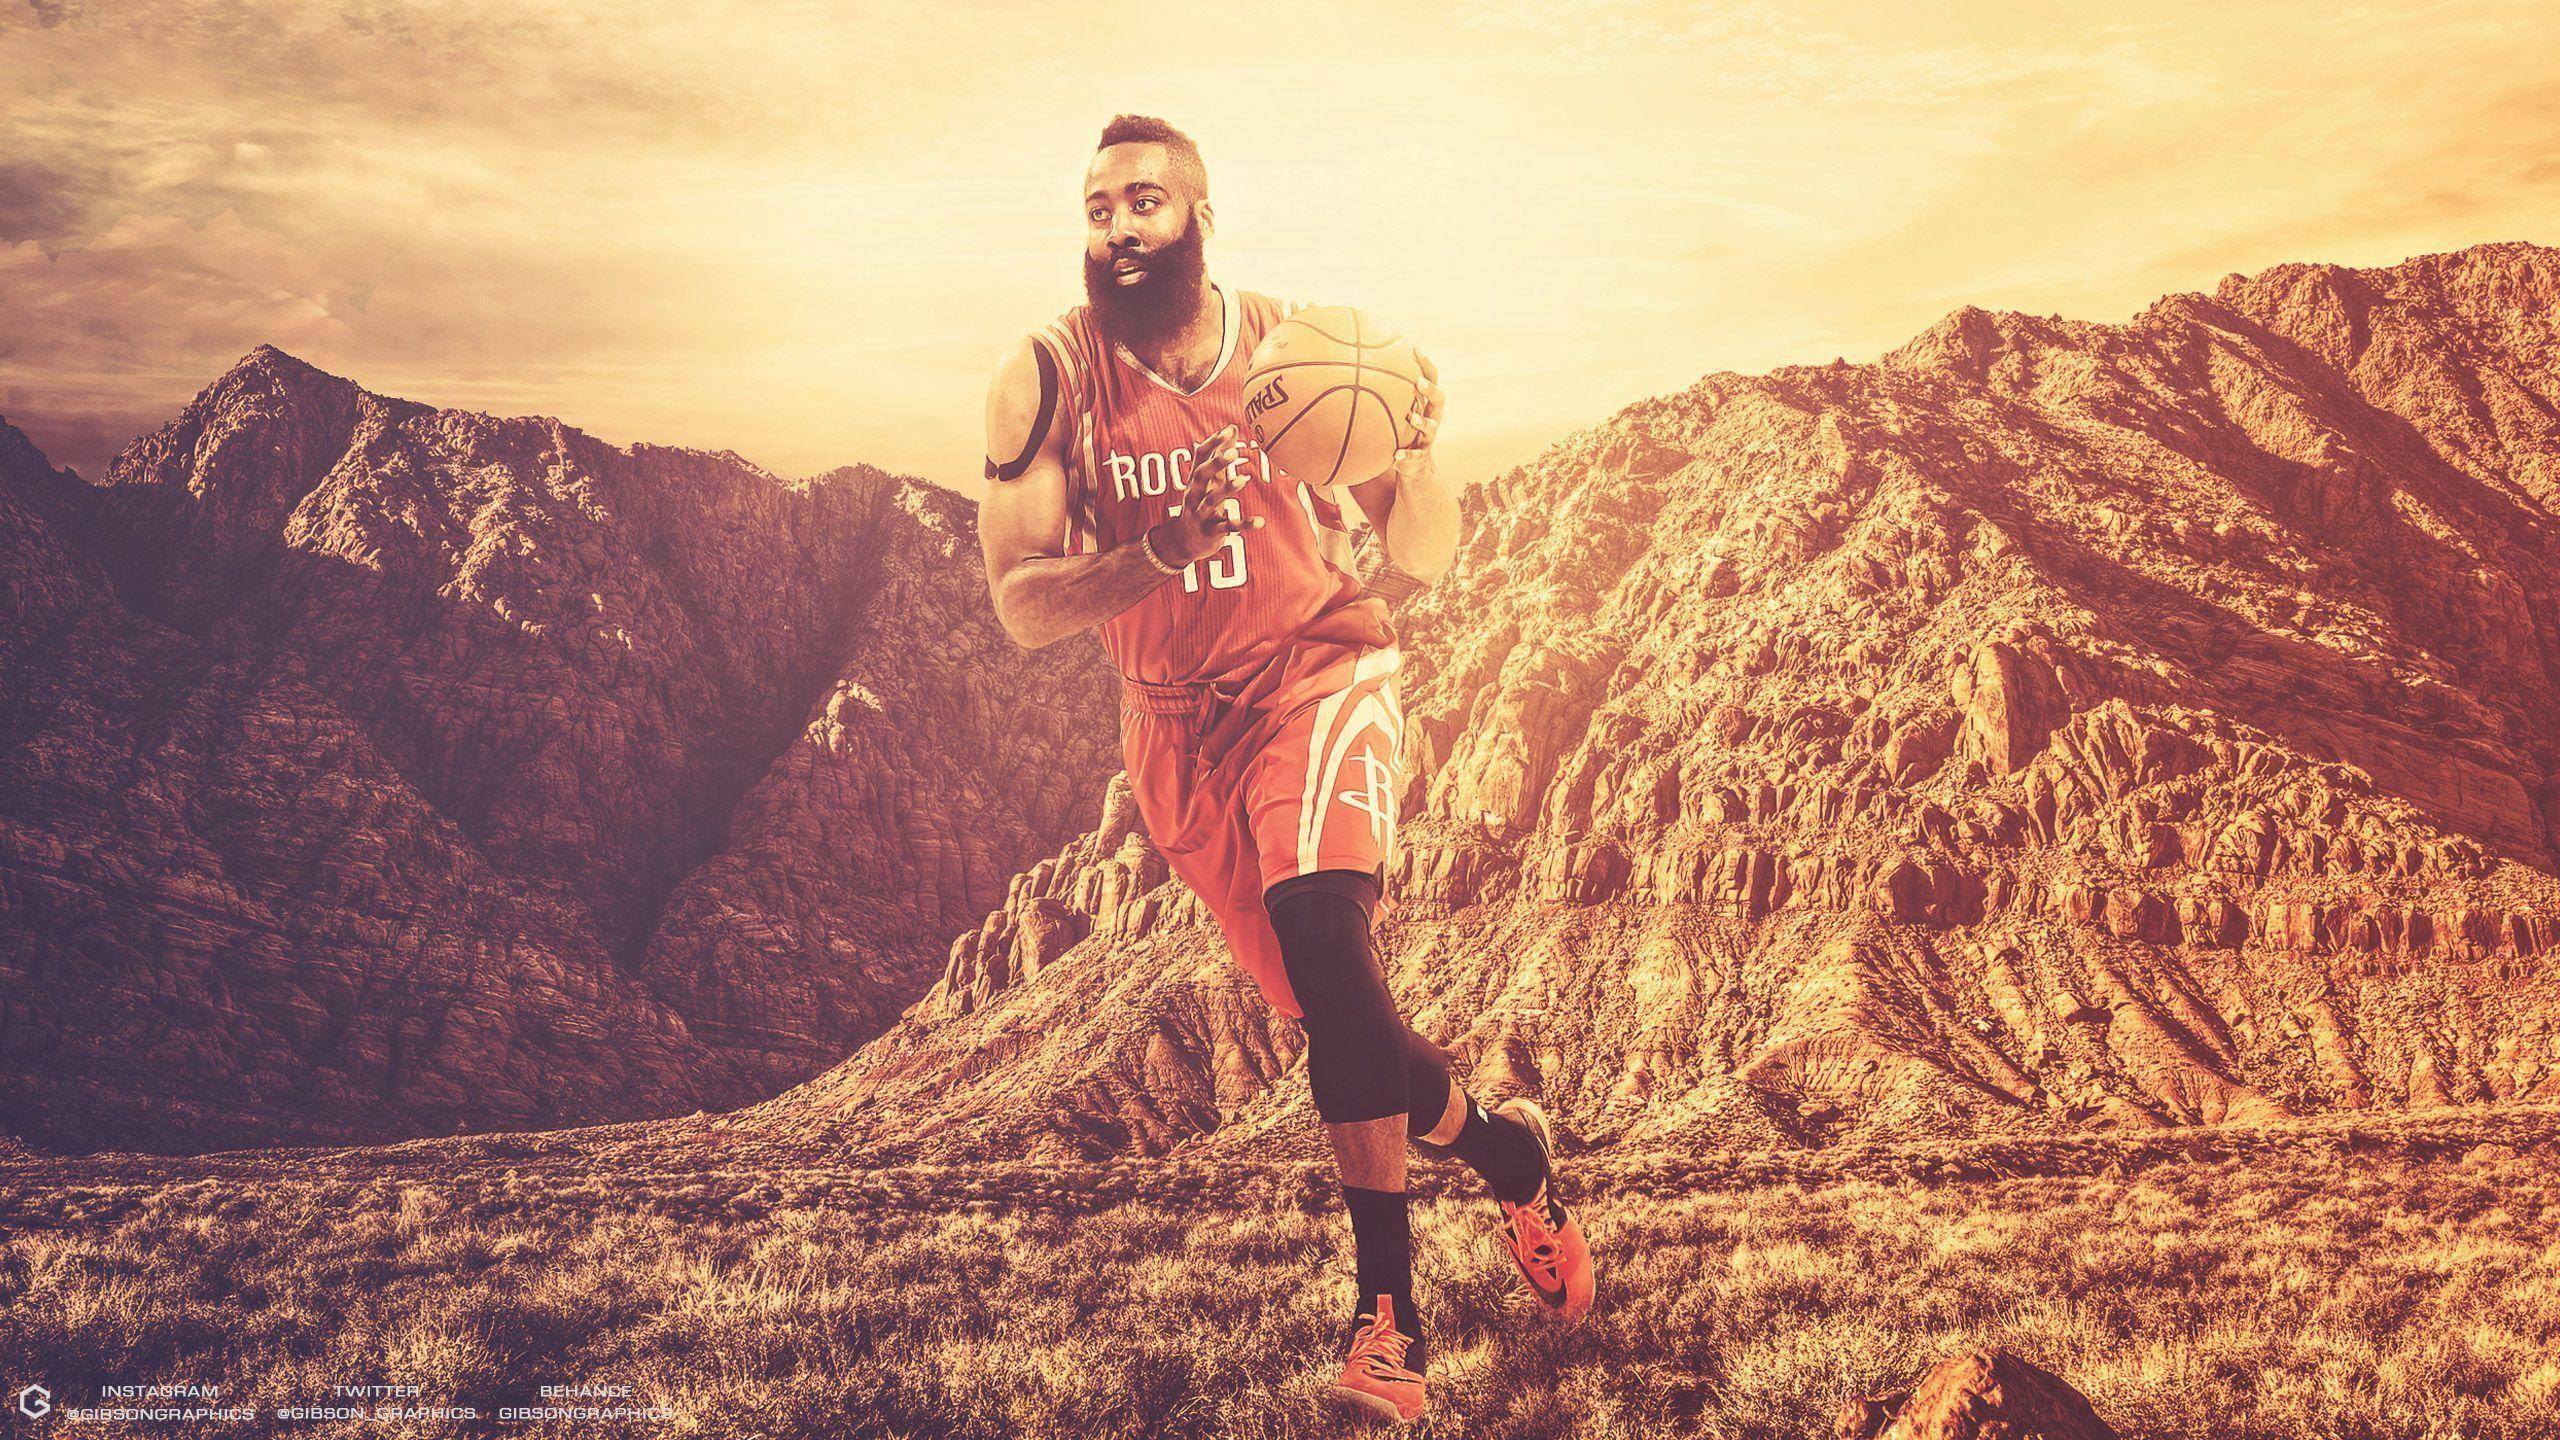 Houston Rockets Wallpapers | Basketball Wallpapers at .